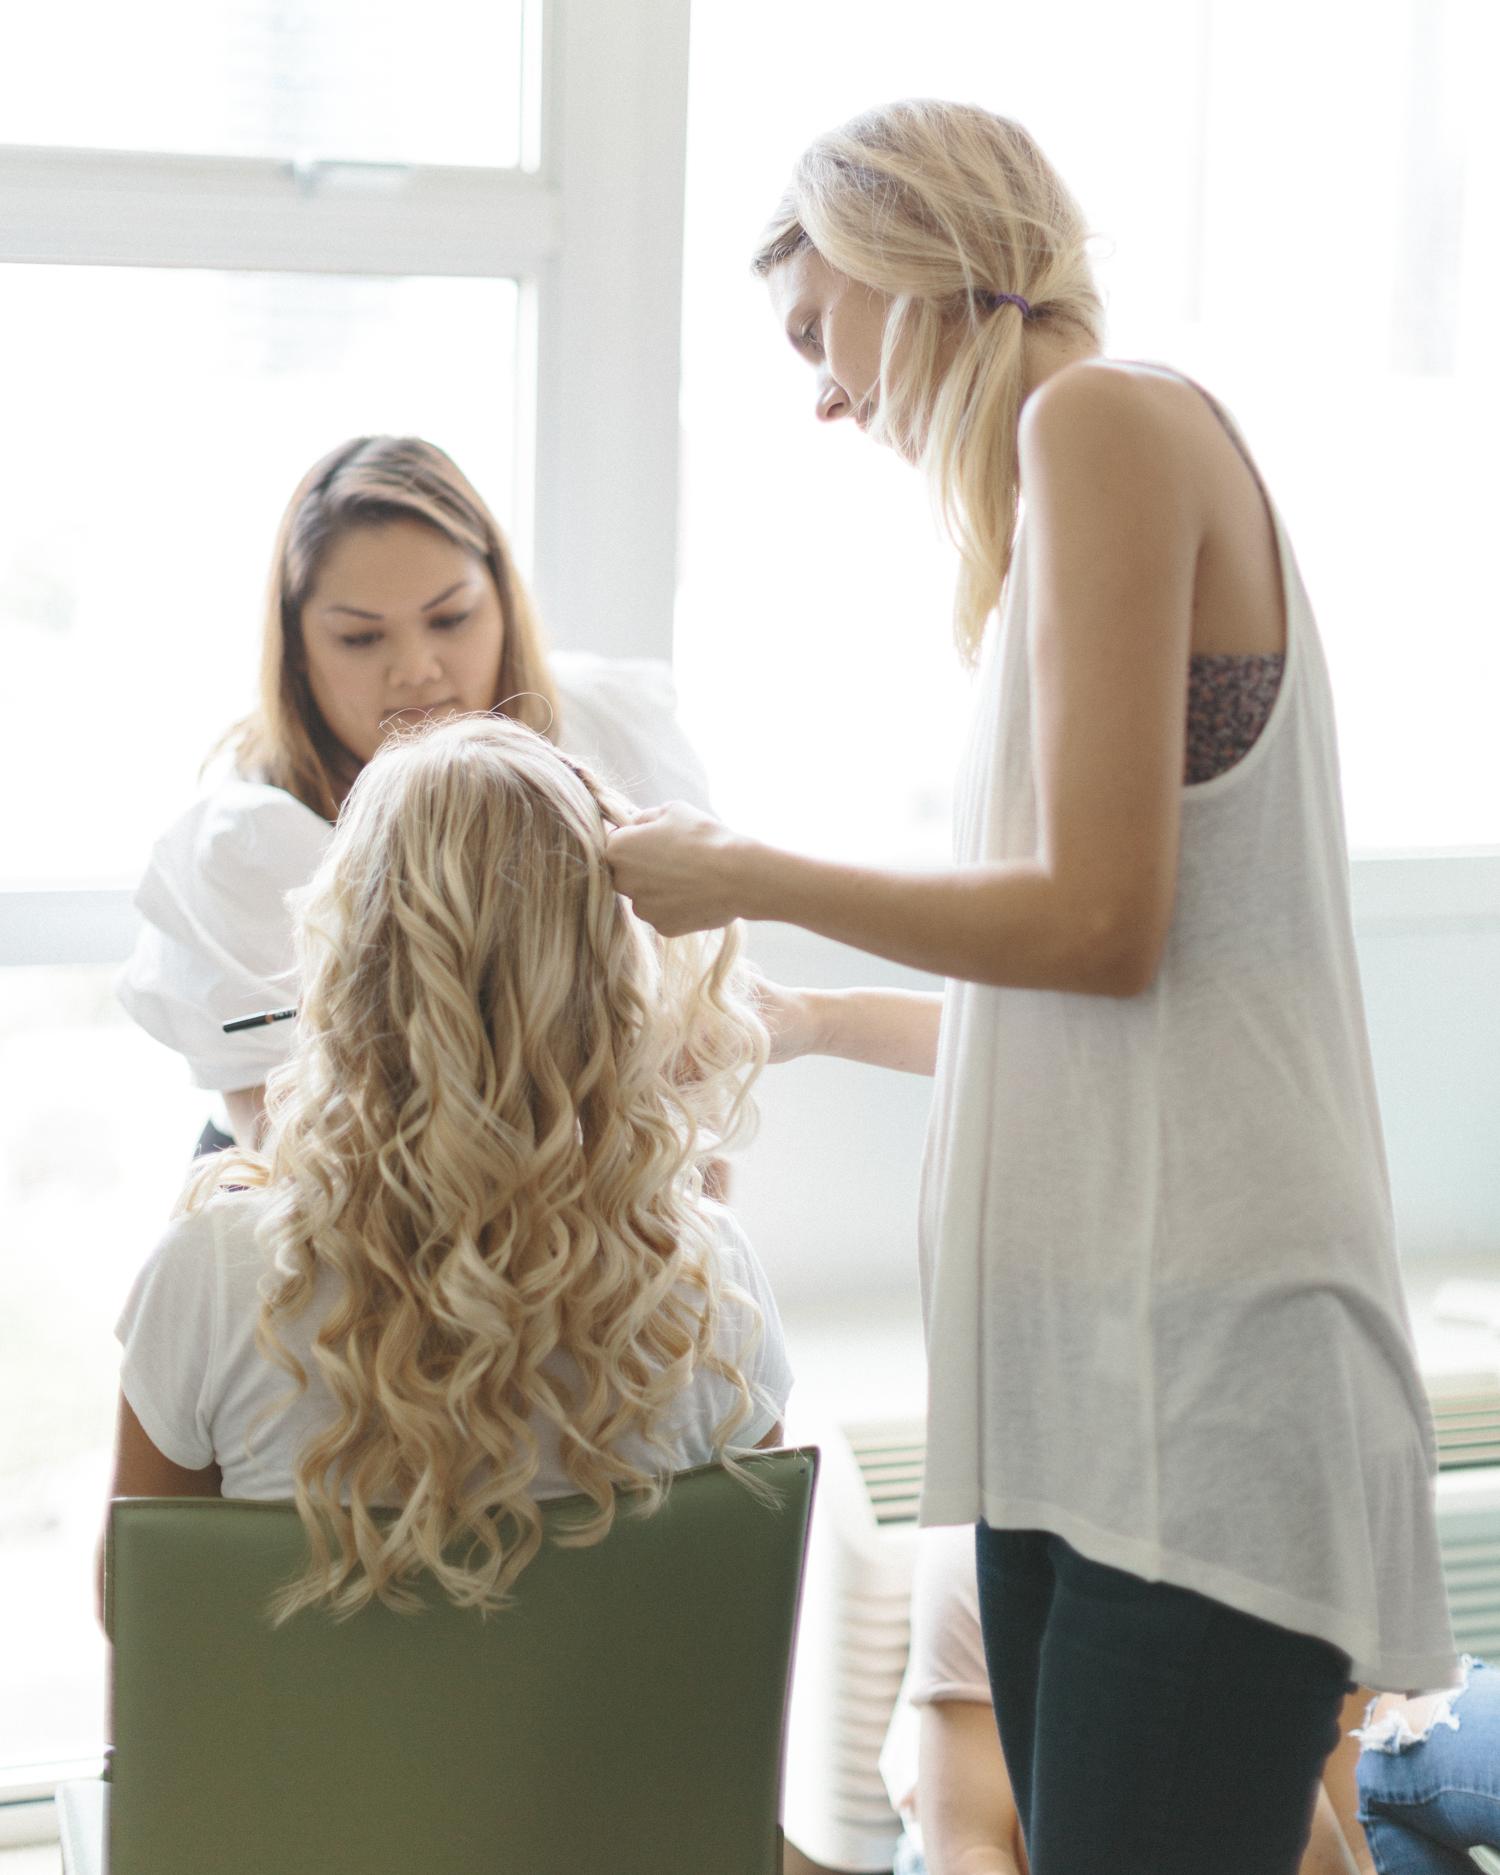 Mike Vidales Headshot Photographer Reveal Hair and Makeup Oahu